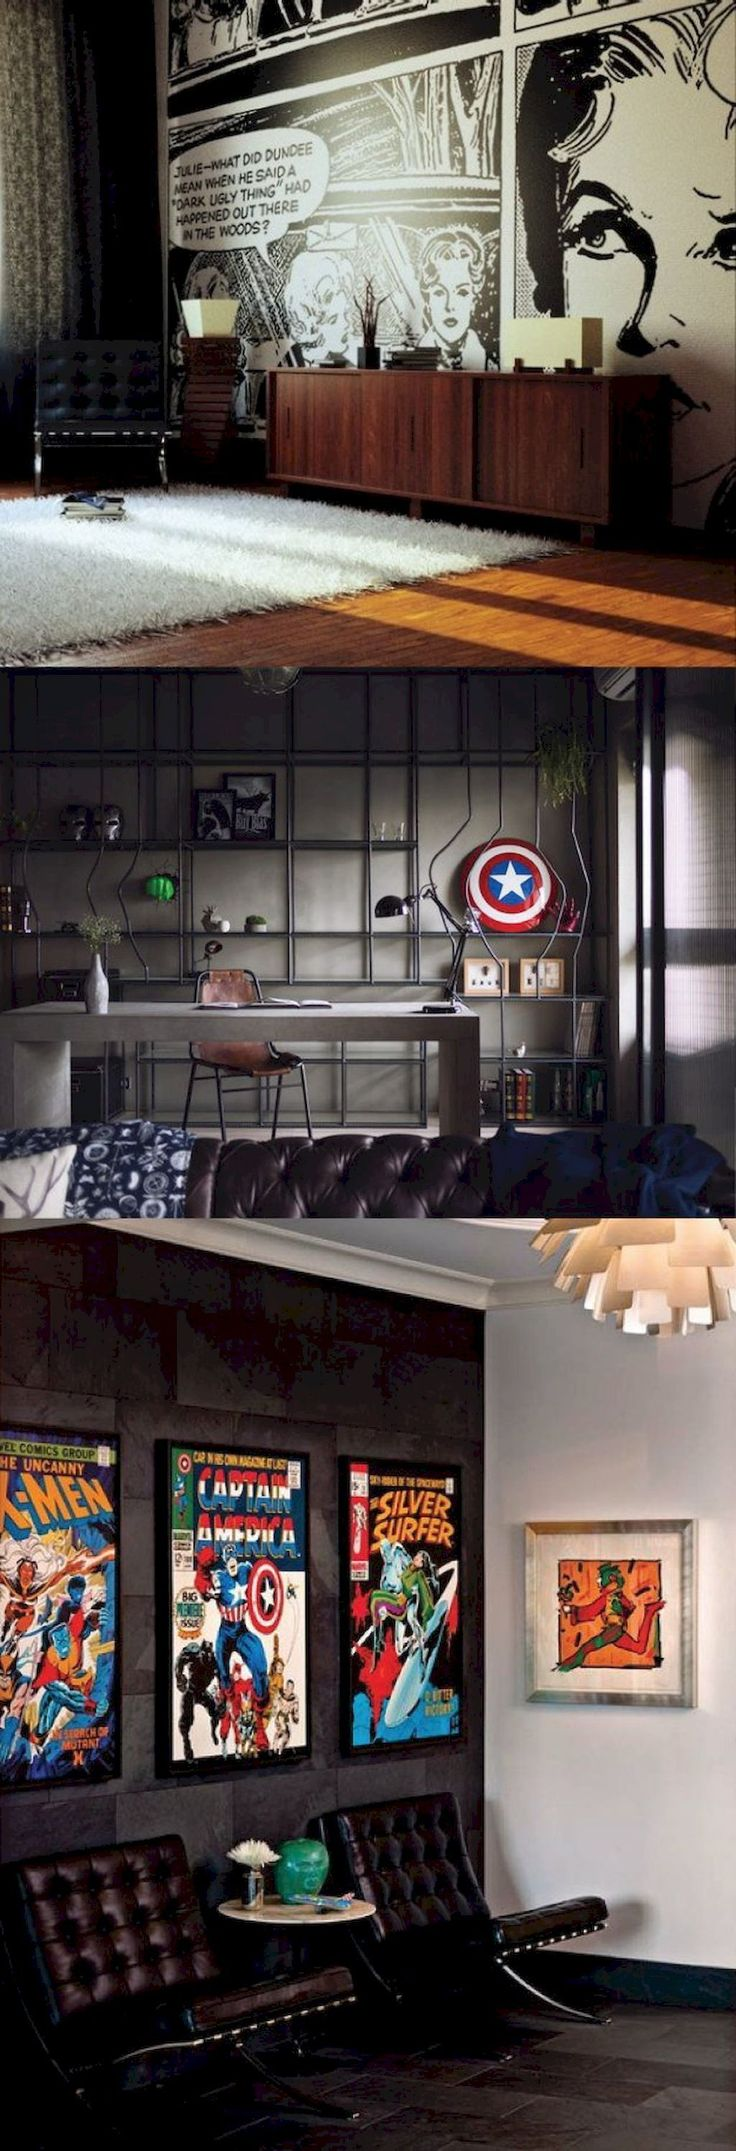 Adorable 70 Simple Home Office Decor Ideas for Men https://roomaniac.com